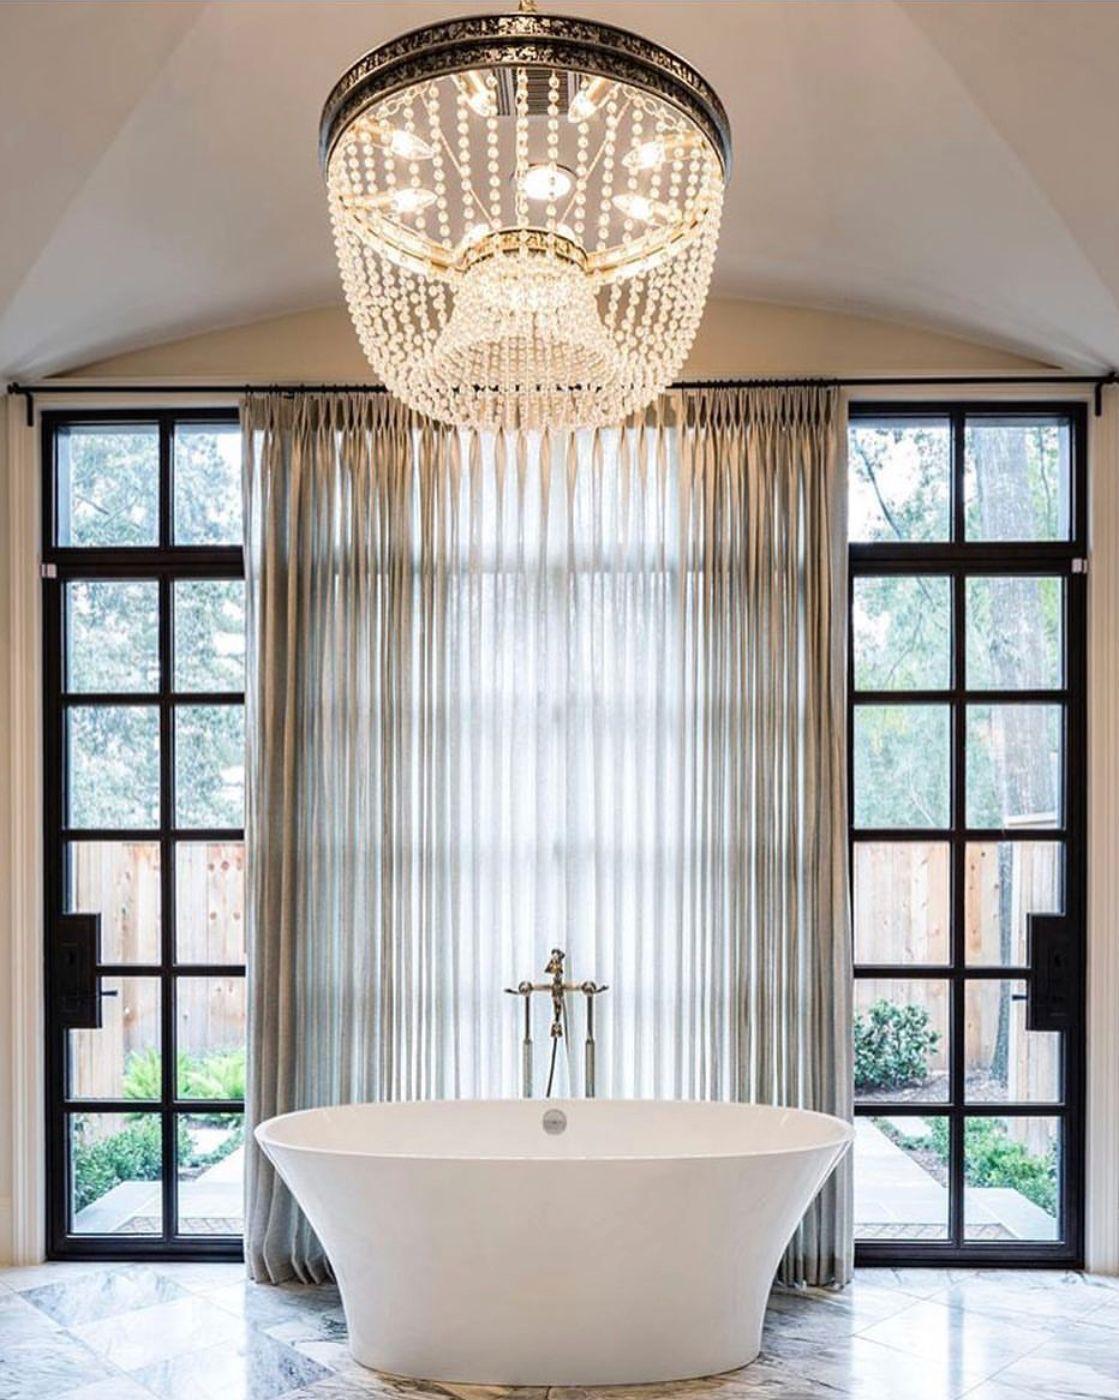 Dream bath #BathroomToilets | Bathroom Toilets | Pinterest | Toilet ...